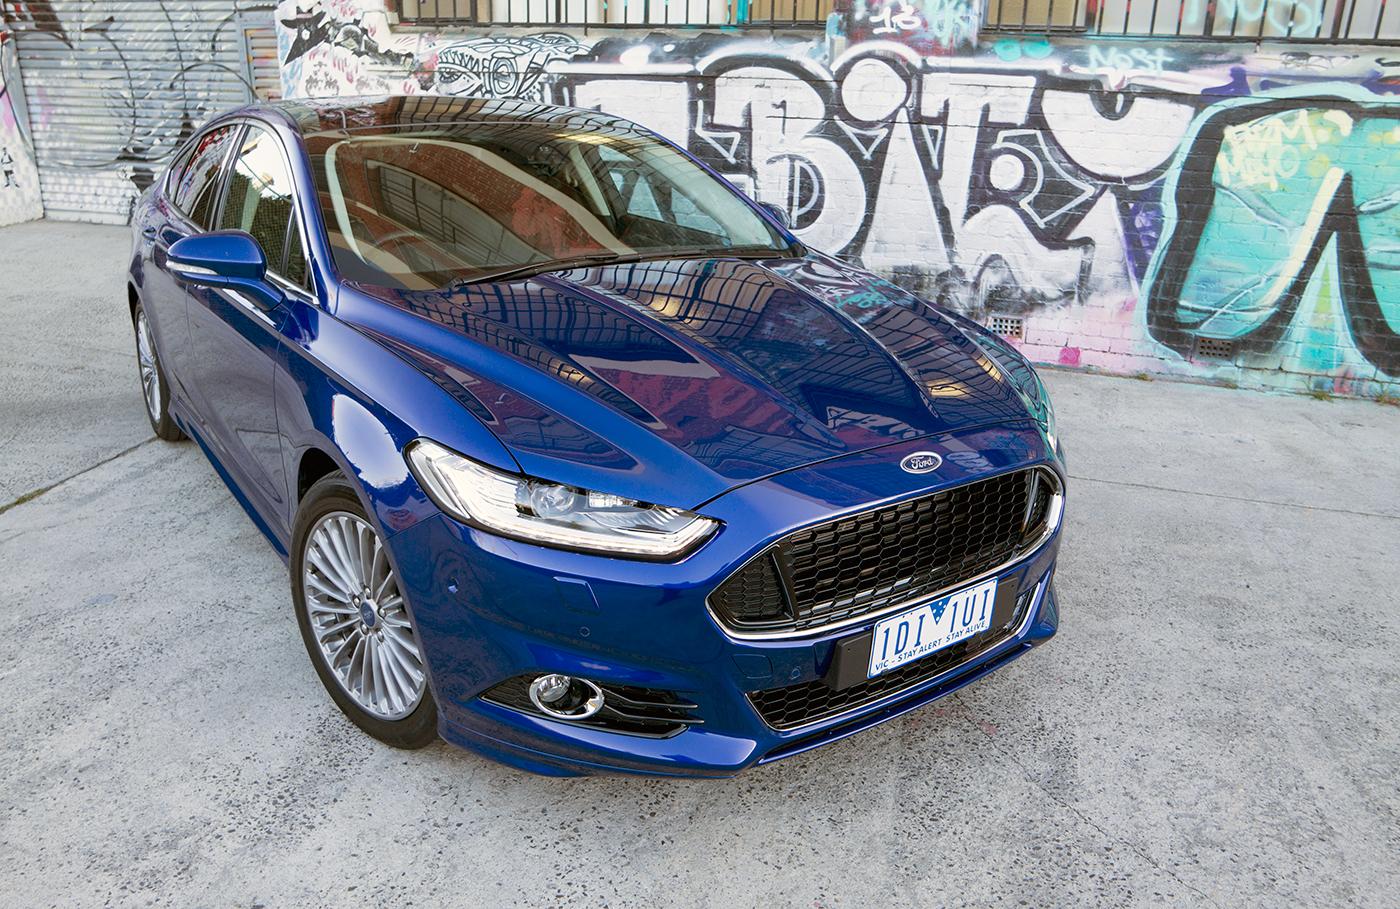 2015 Ford Mondeo Titanium Review: Falcon, what Falcon?